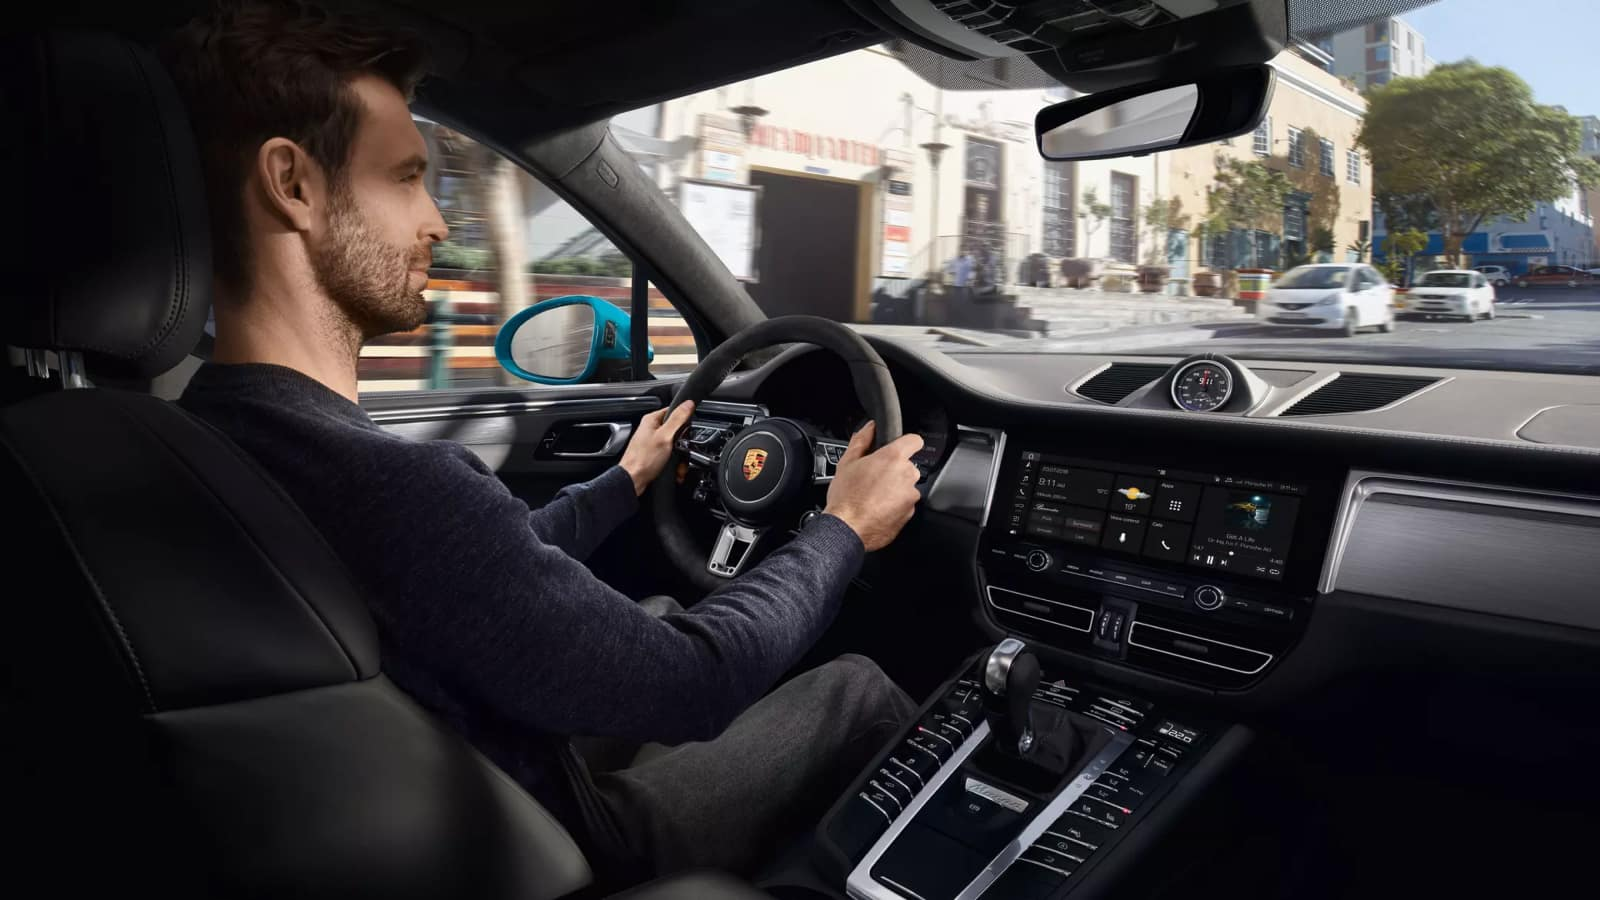 2020 Porsche Macan vs 2020 Porsche Cayenne